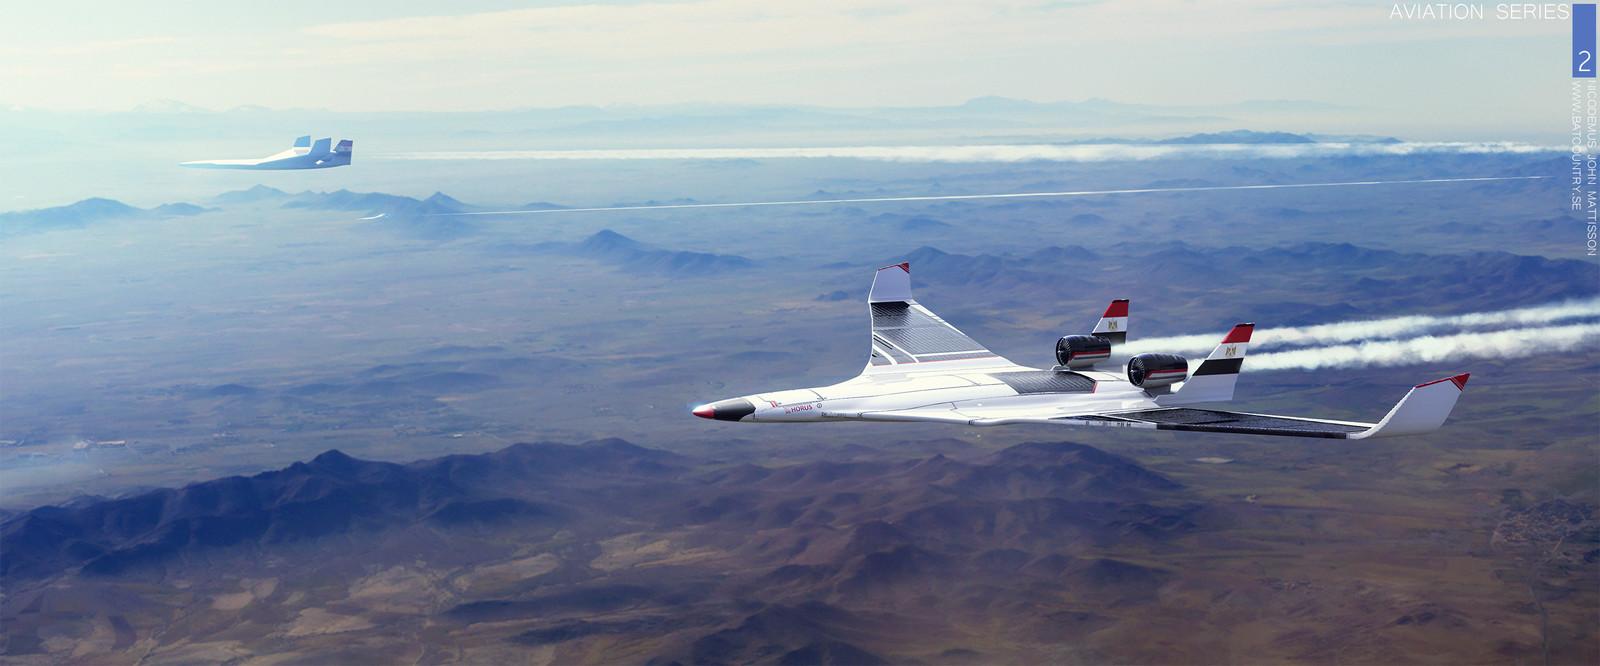 Aviation Series 2: Horus Test Flight